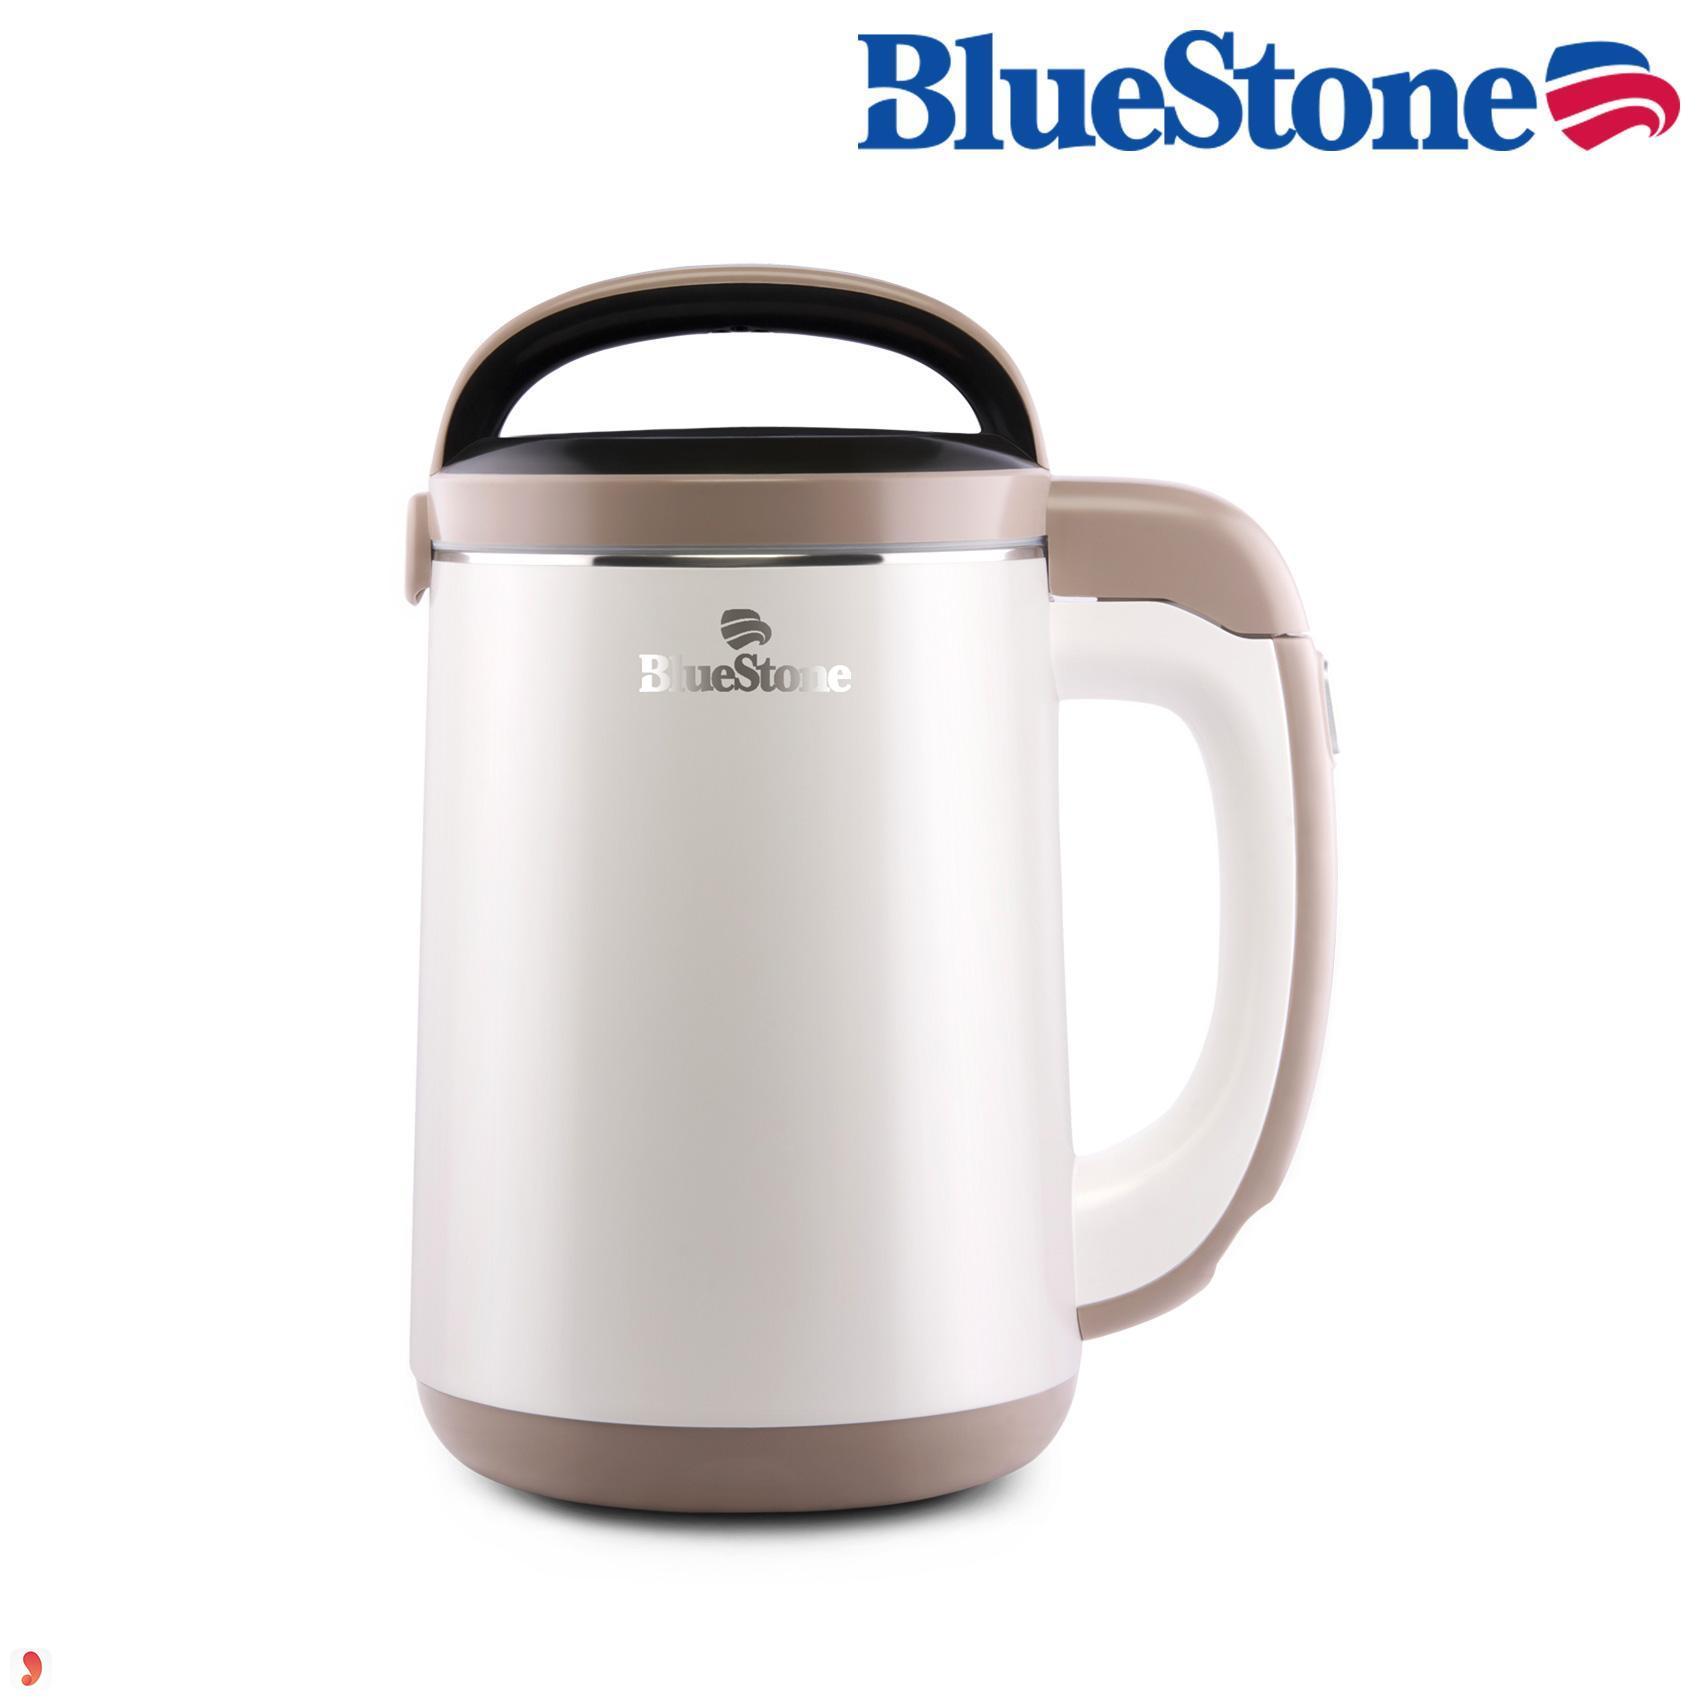 Bluestone SMB-7358 1